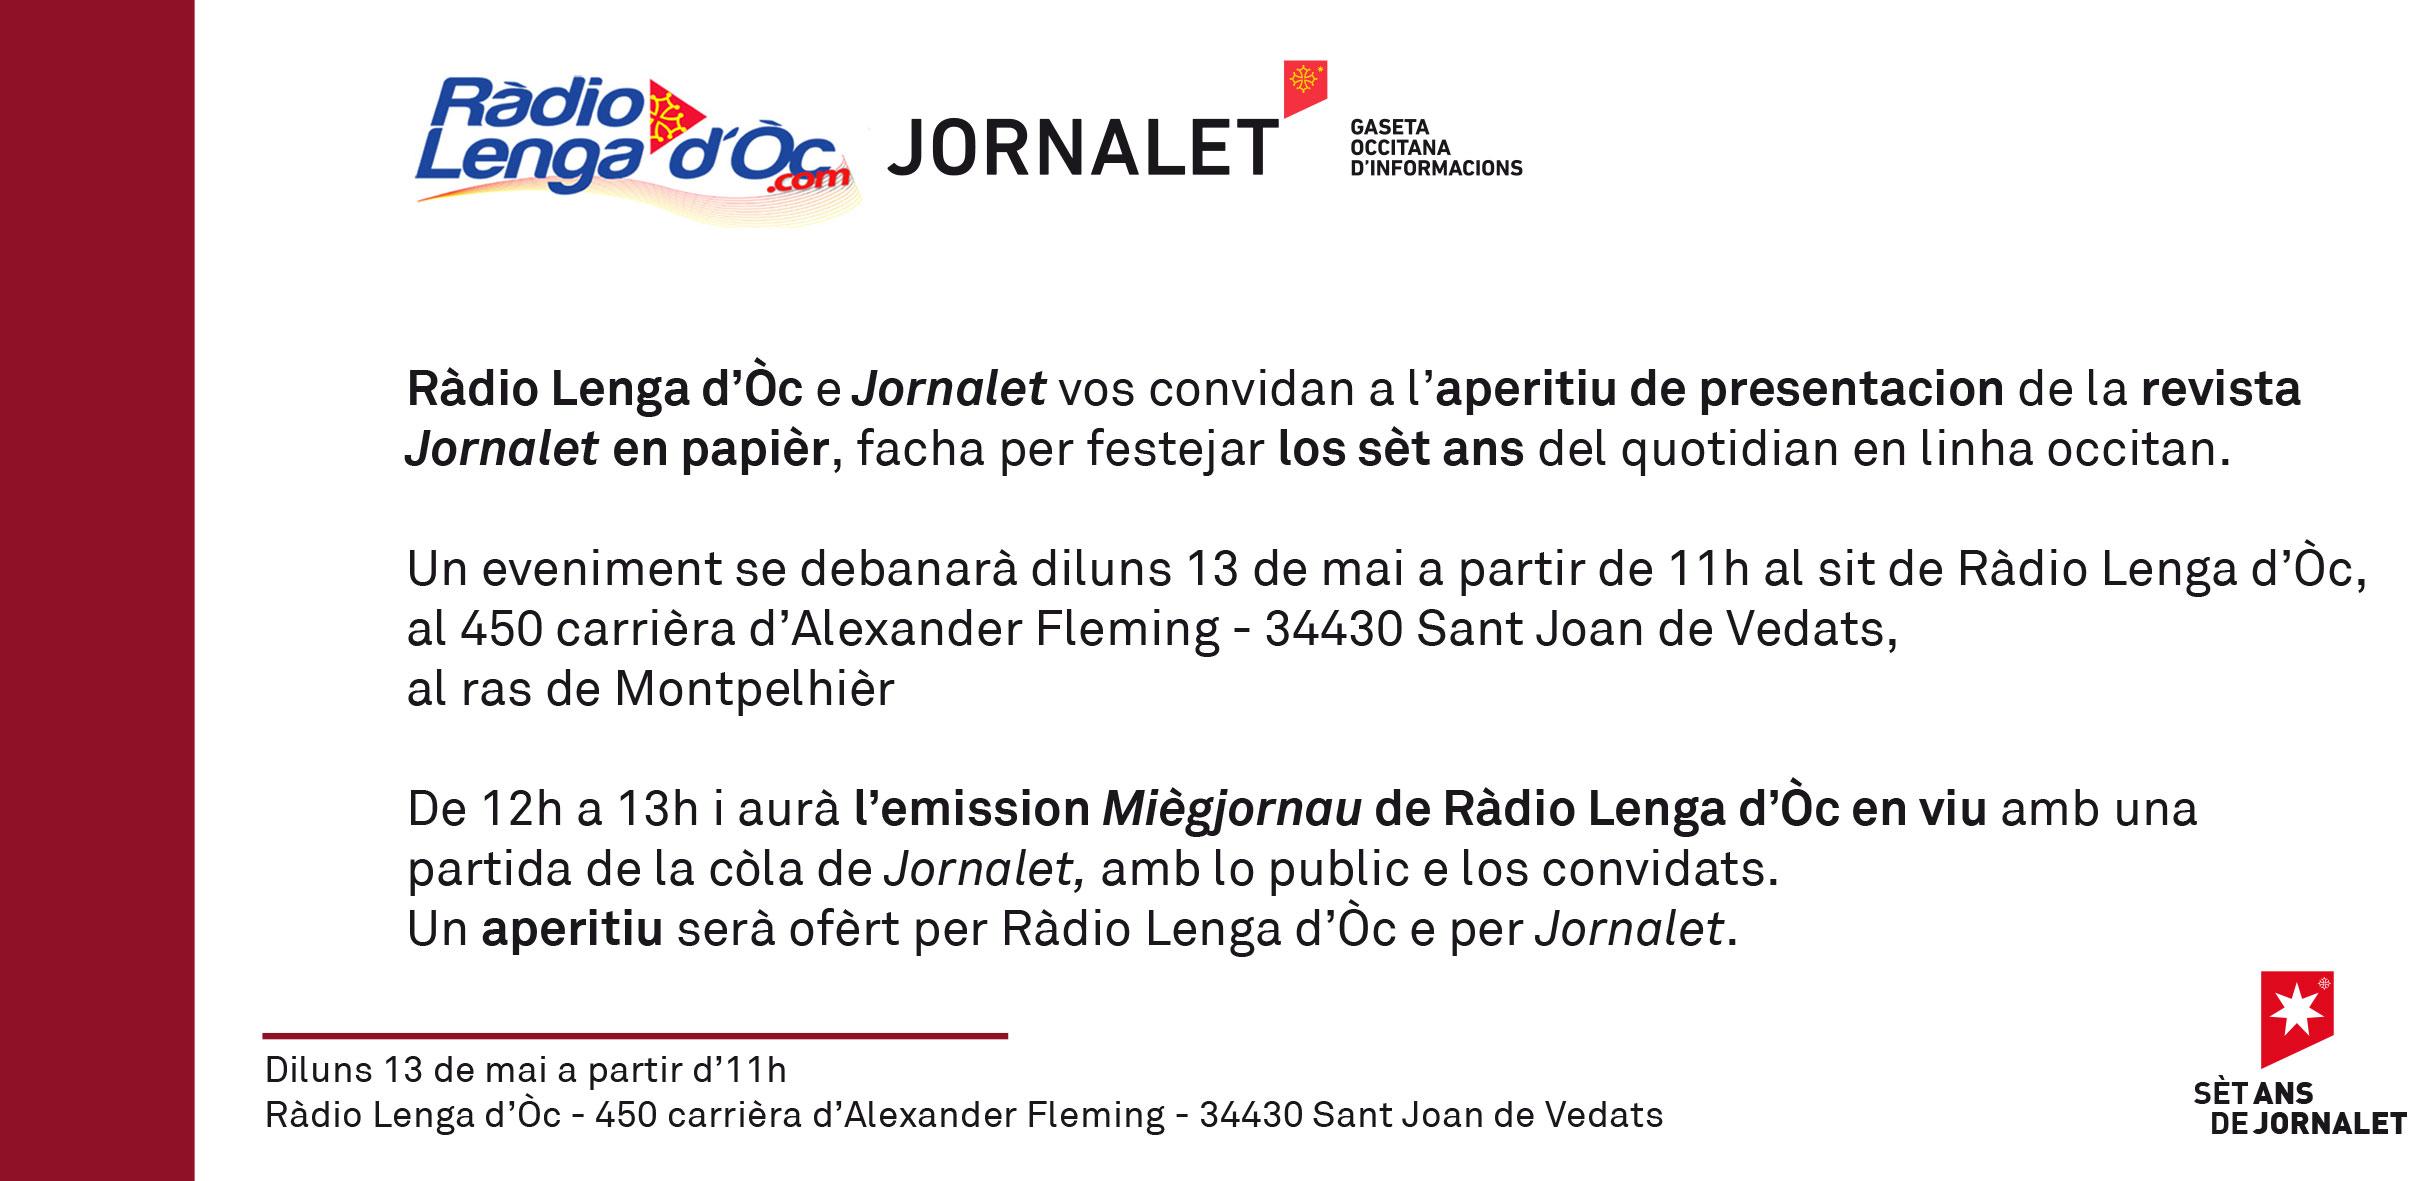 https://www.jornalet.com/imatges/images/invitacion-RLO-0519.jpg